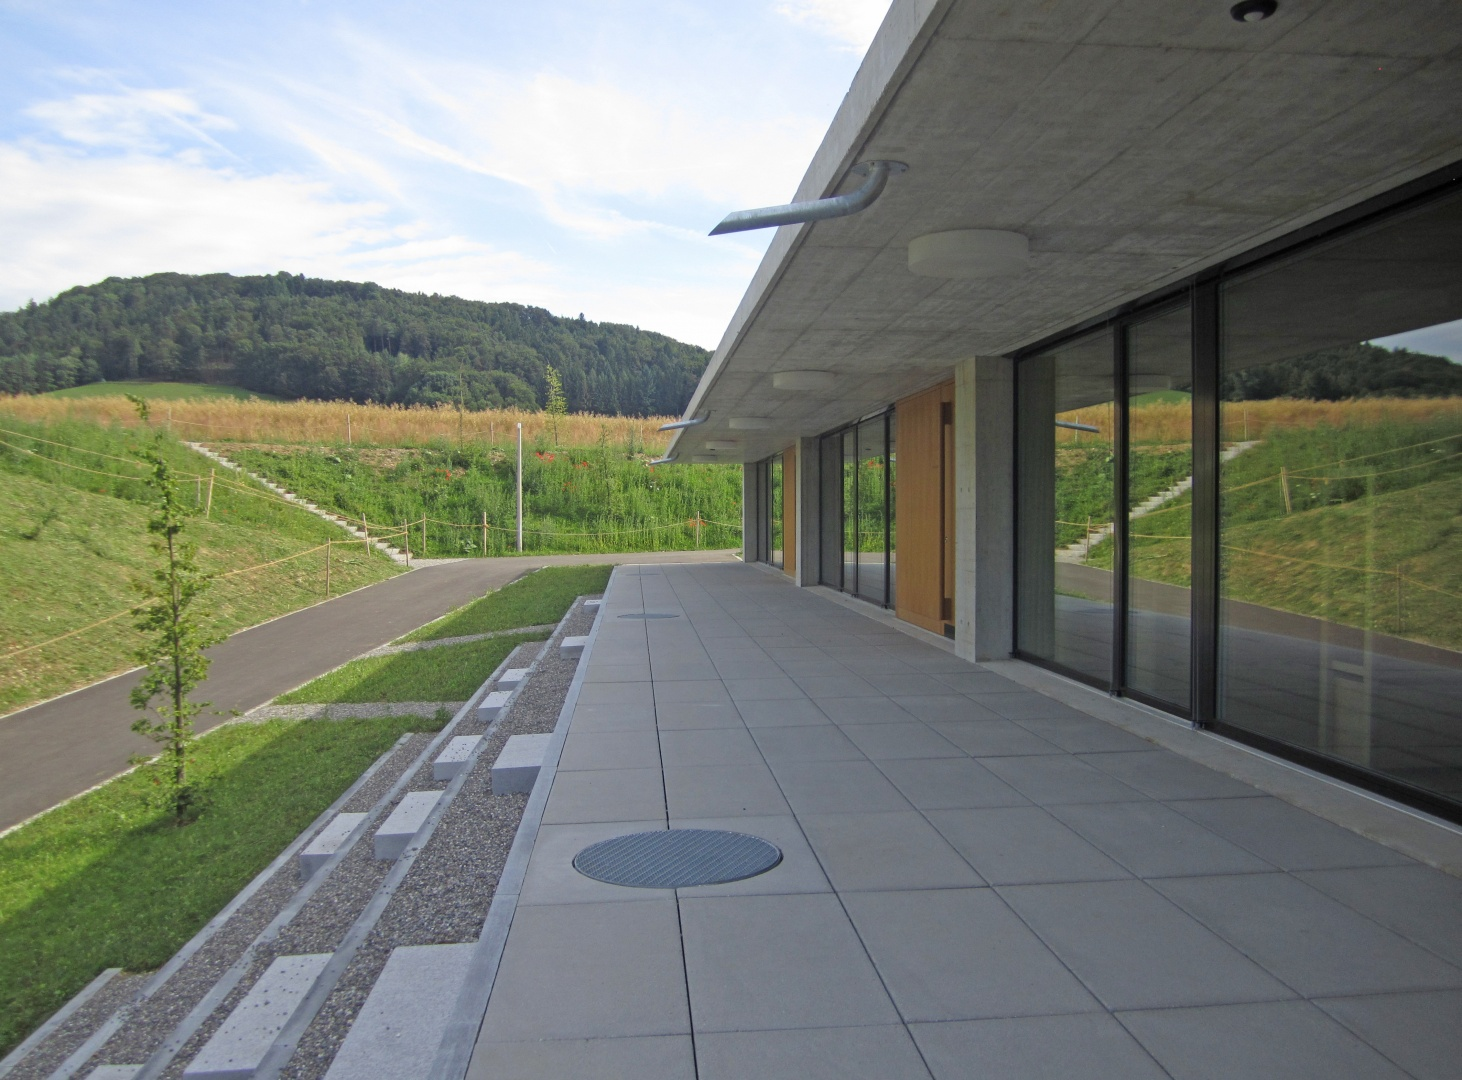 Vorplatz Kindergärten © Hopf & Wirth Architekten, Rychenbergstrasse 2,  8400 Winterthur